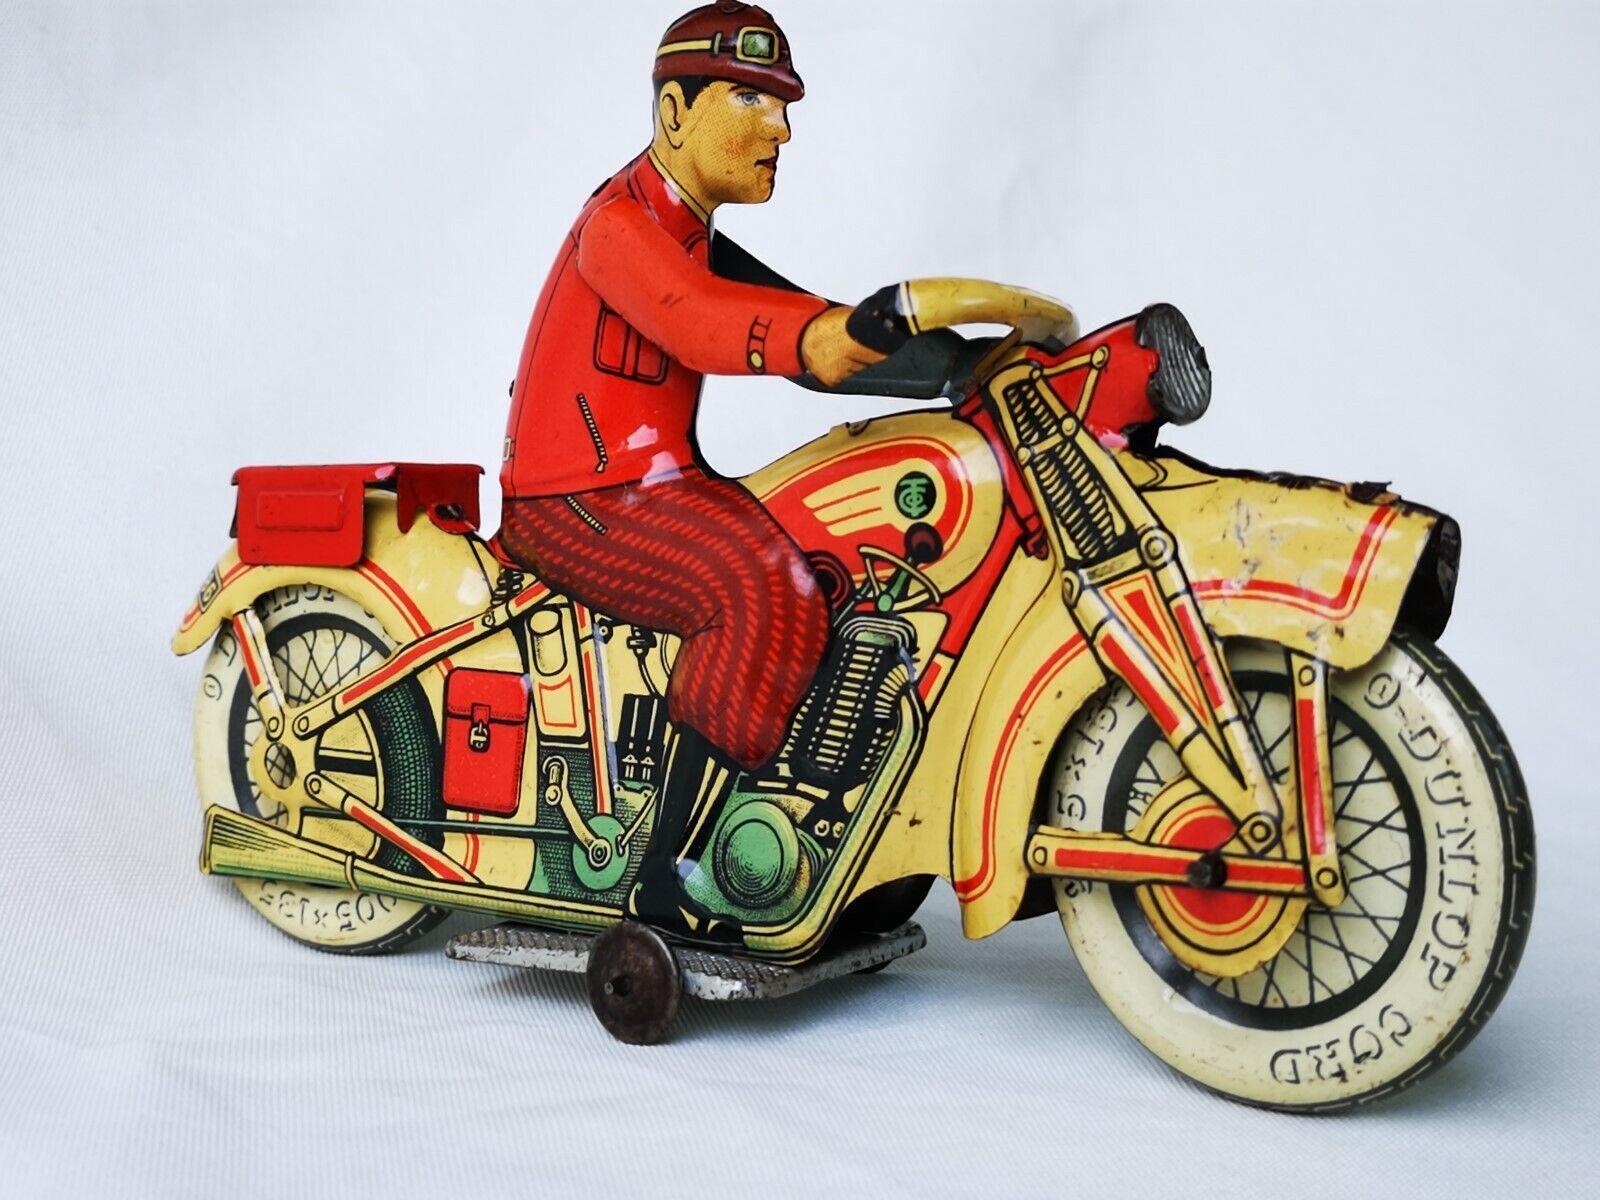 Tippco T586 Motorcycle Tin Toy - Motorrad Blech Motor Rare   Selten